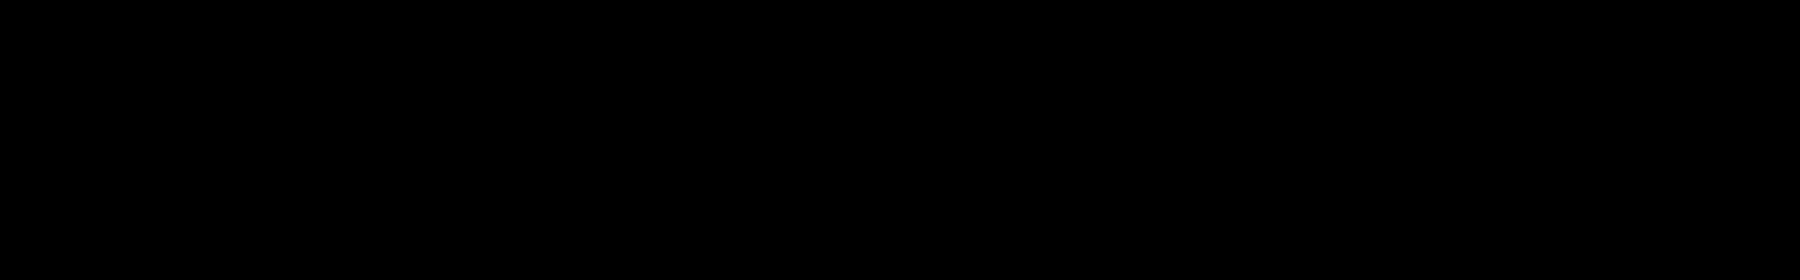 XOXO V.4 audio waveform